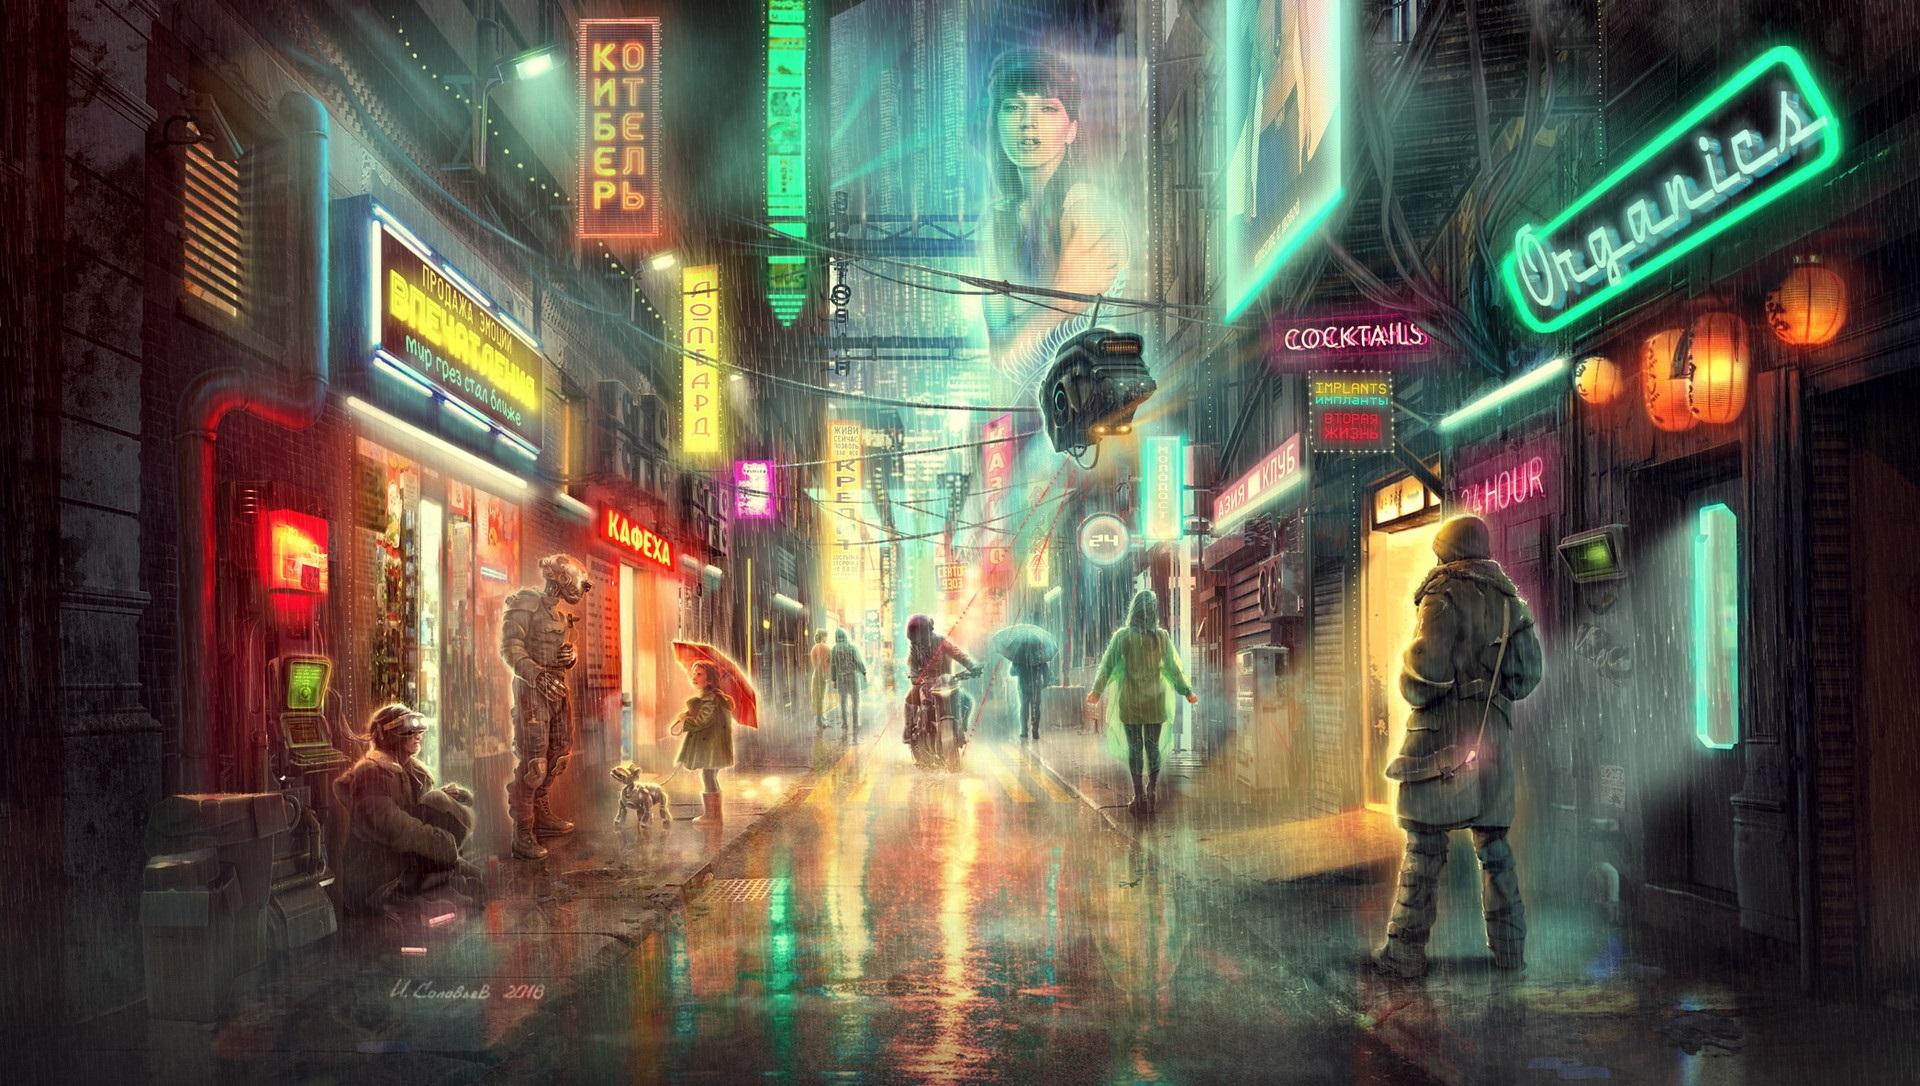 General 1920x1086 artwork fantasy art steampunk city street neon rain futuristic